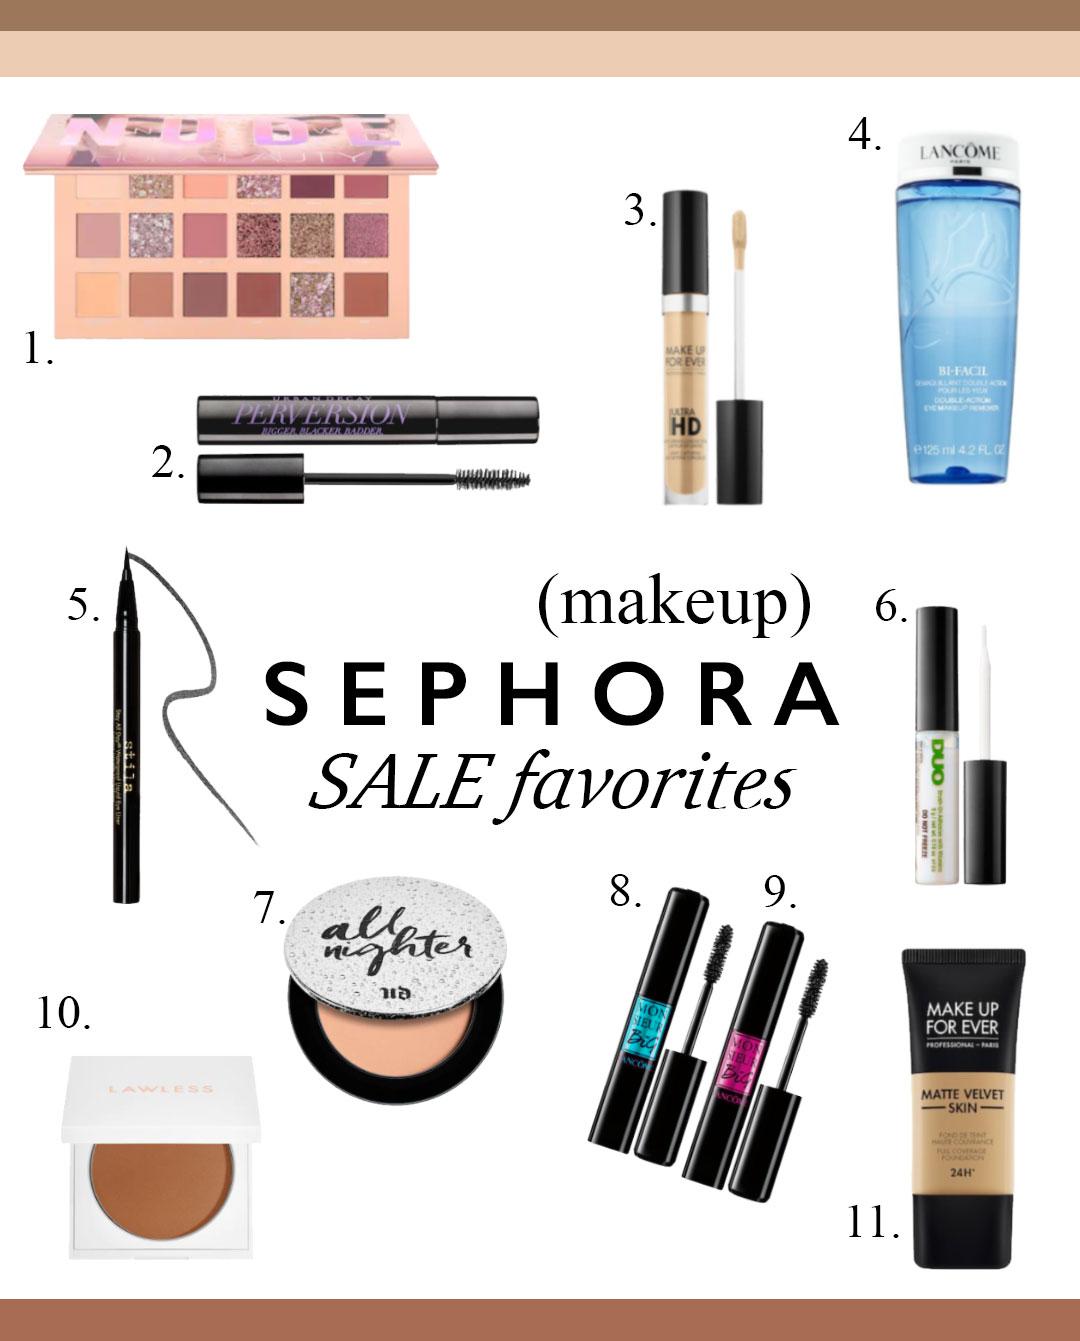 sephora, spring sale, makeup, beauty, eyeshadow, eyeliner, concealer, foundation, mascara, waterproof mascara, bronzer, mineral bronzer,